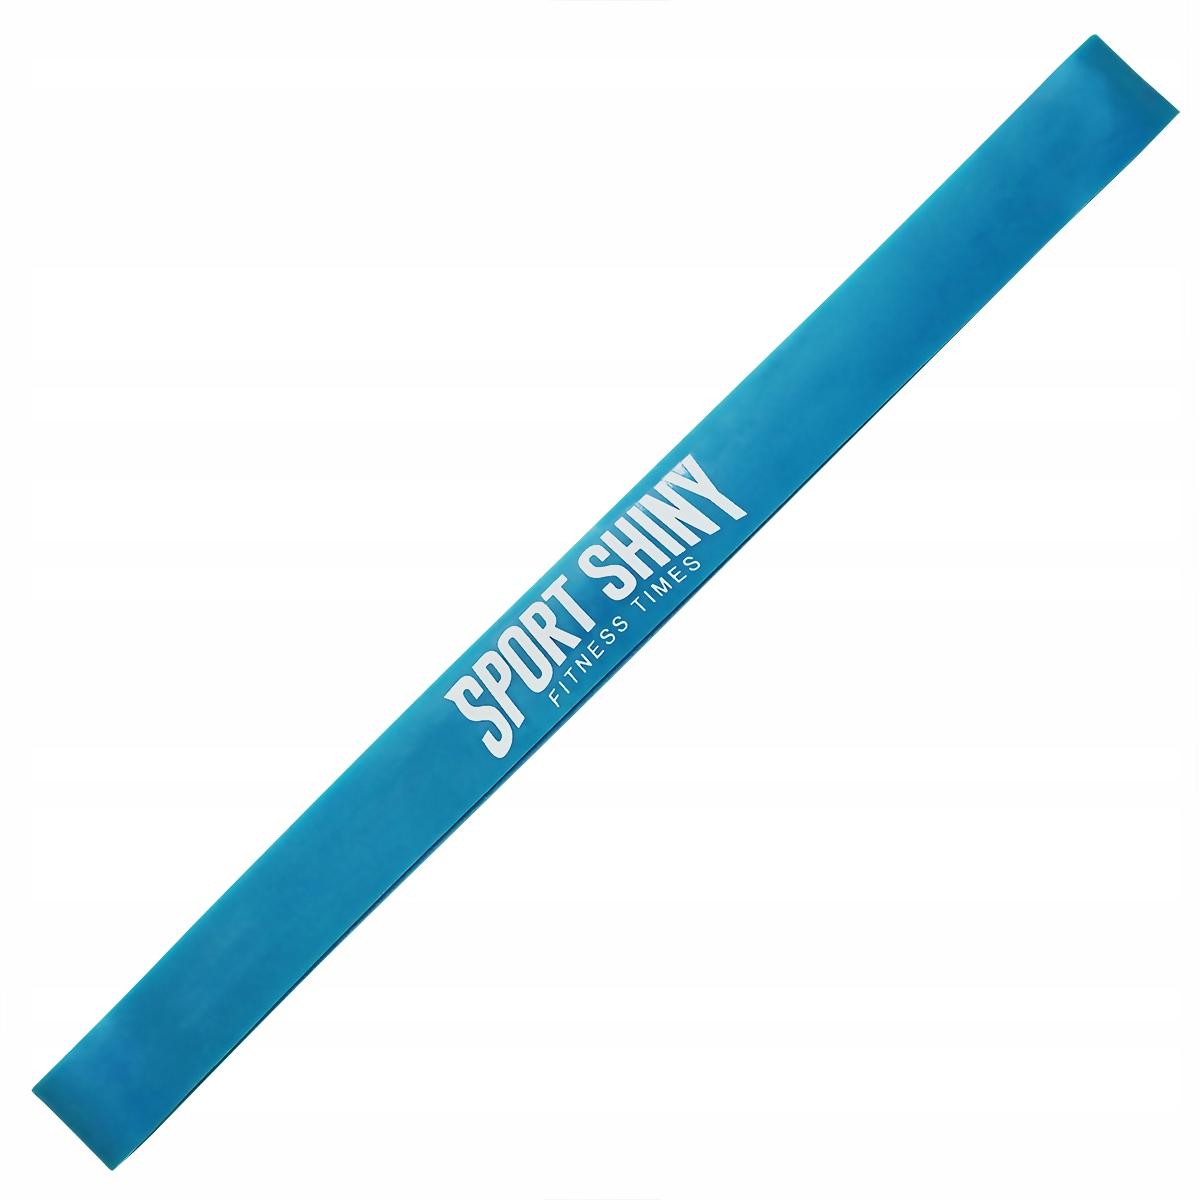 Guma oporowa crossfit – niebieska